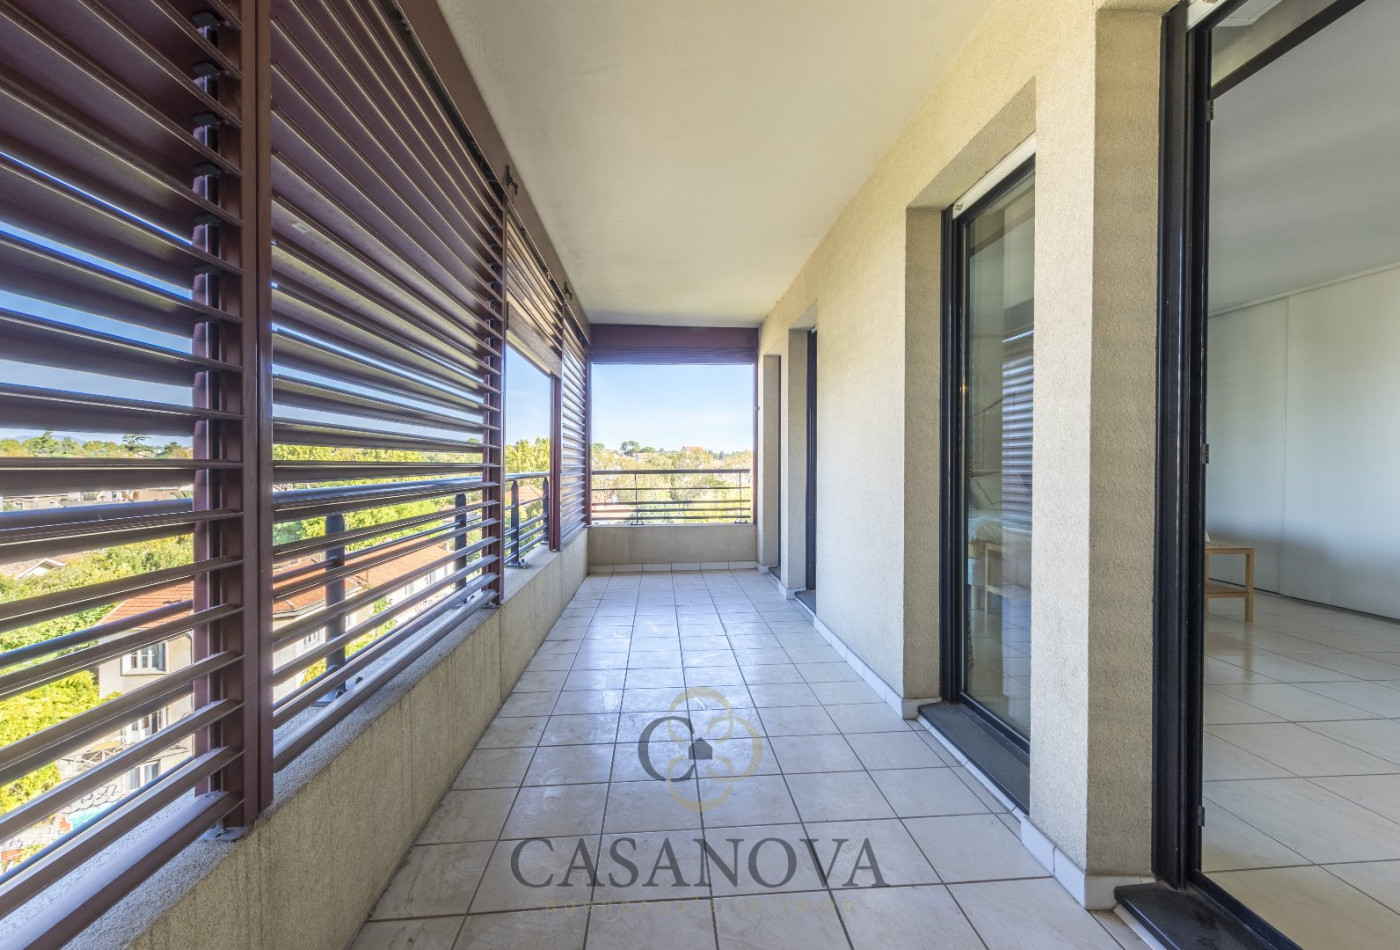 A vendre  Montpellier   Réf 340148204 - Agence galerie casanova